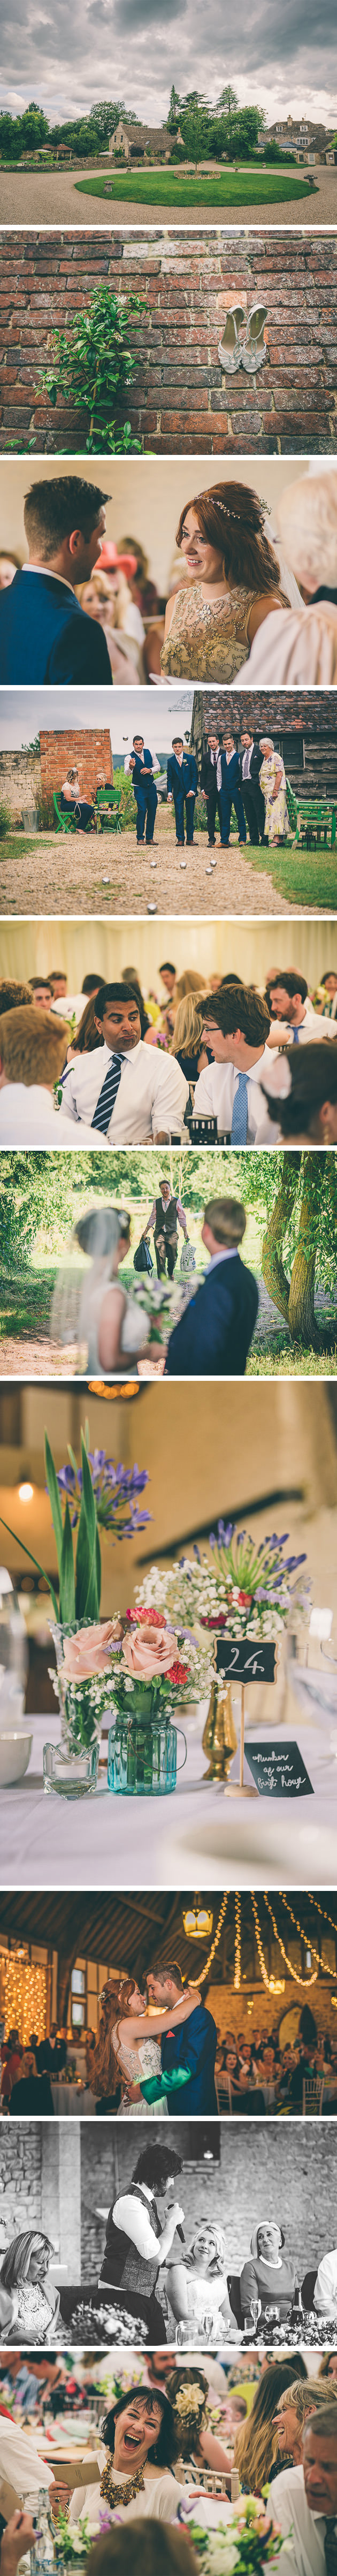 Wedding Center Piece Examples